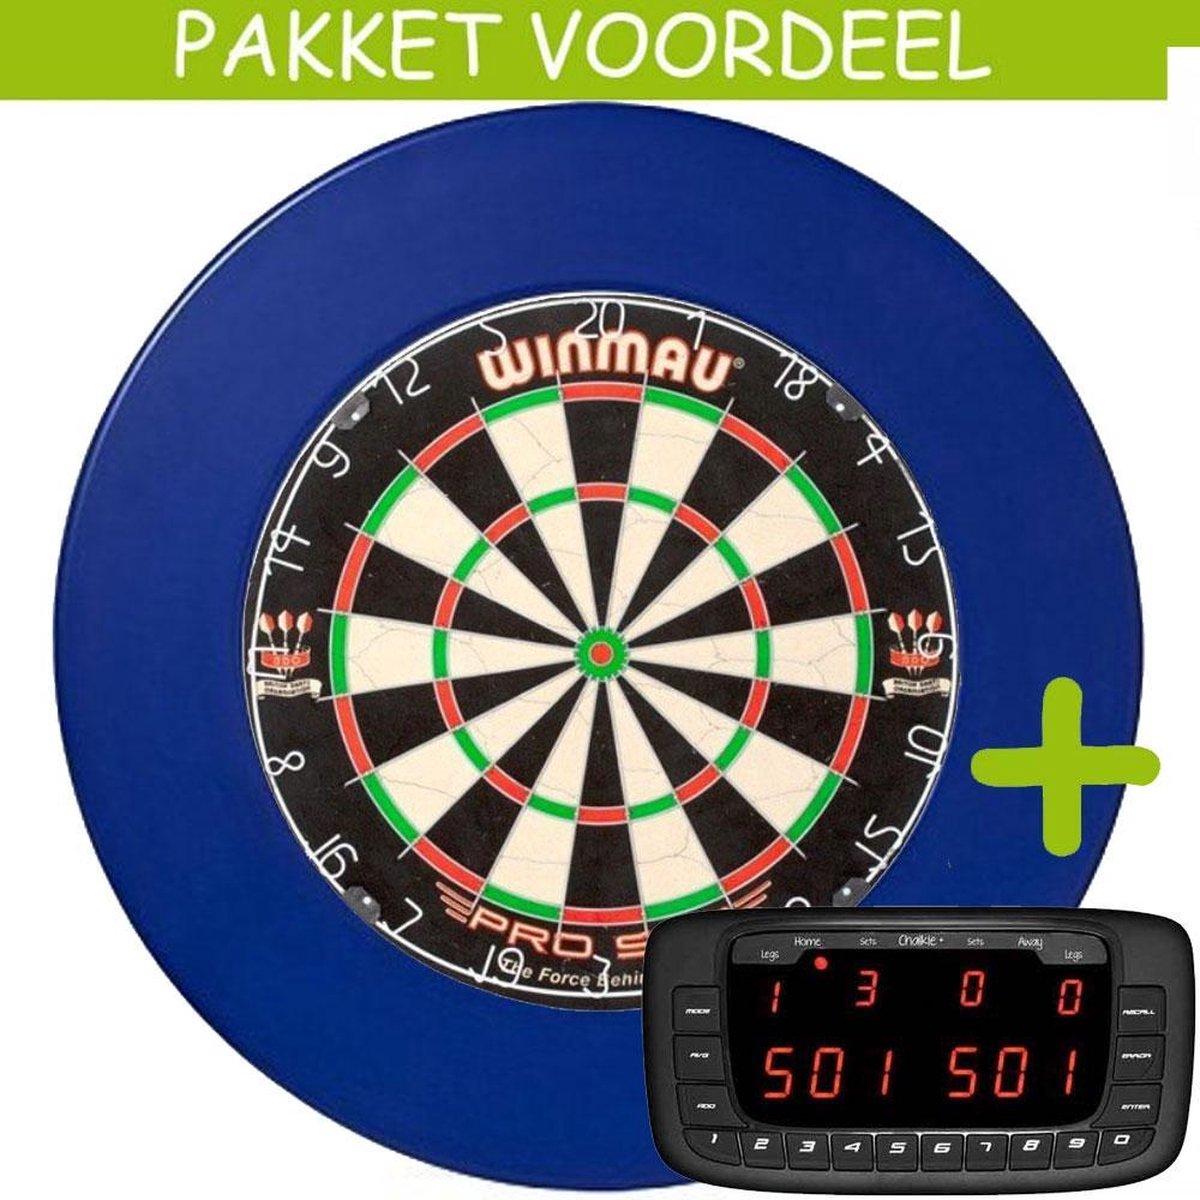 Elektronisch Dart Scorebord VoordeelPakket (Chalkie ) - Pro SFB - Rubberen Surround (Blauw)